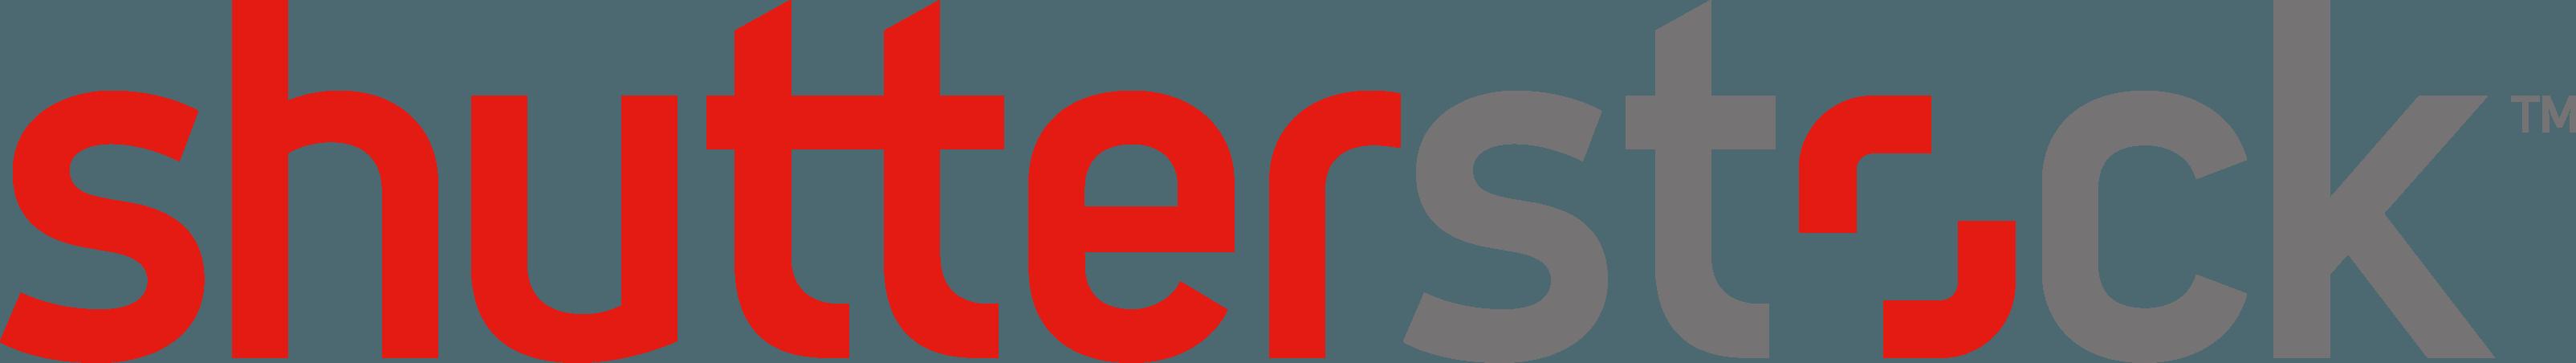 Shutterstock Logo png